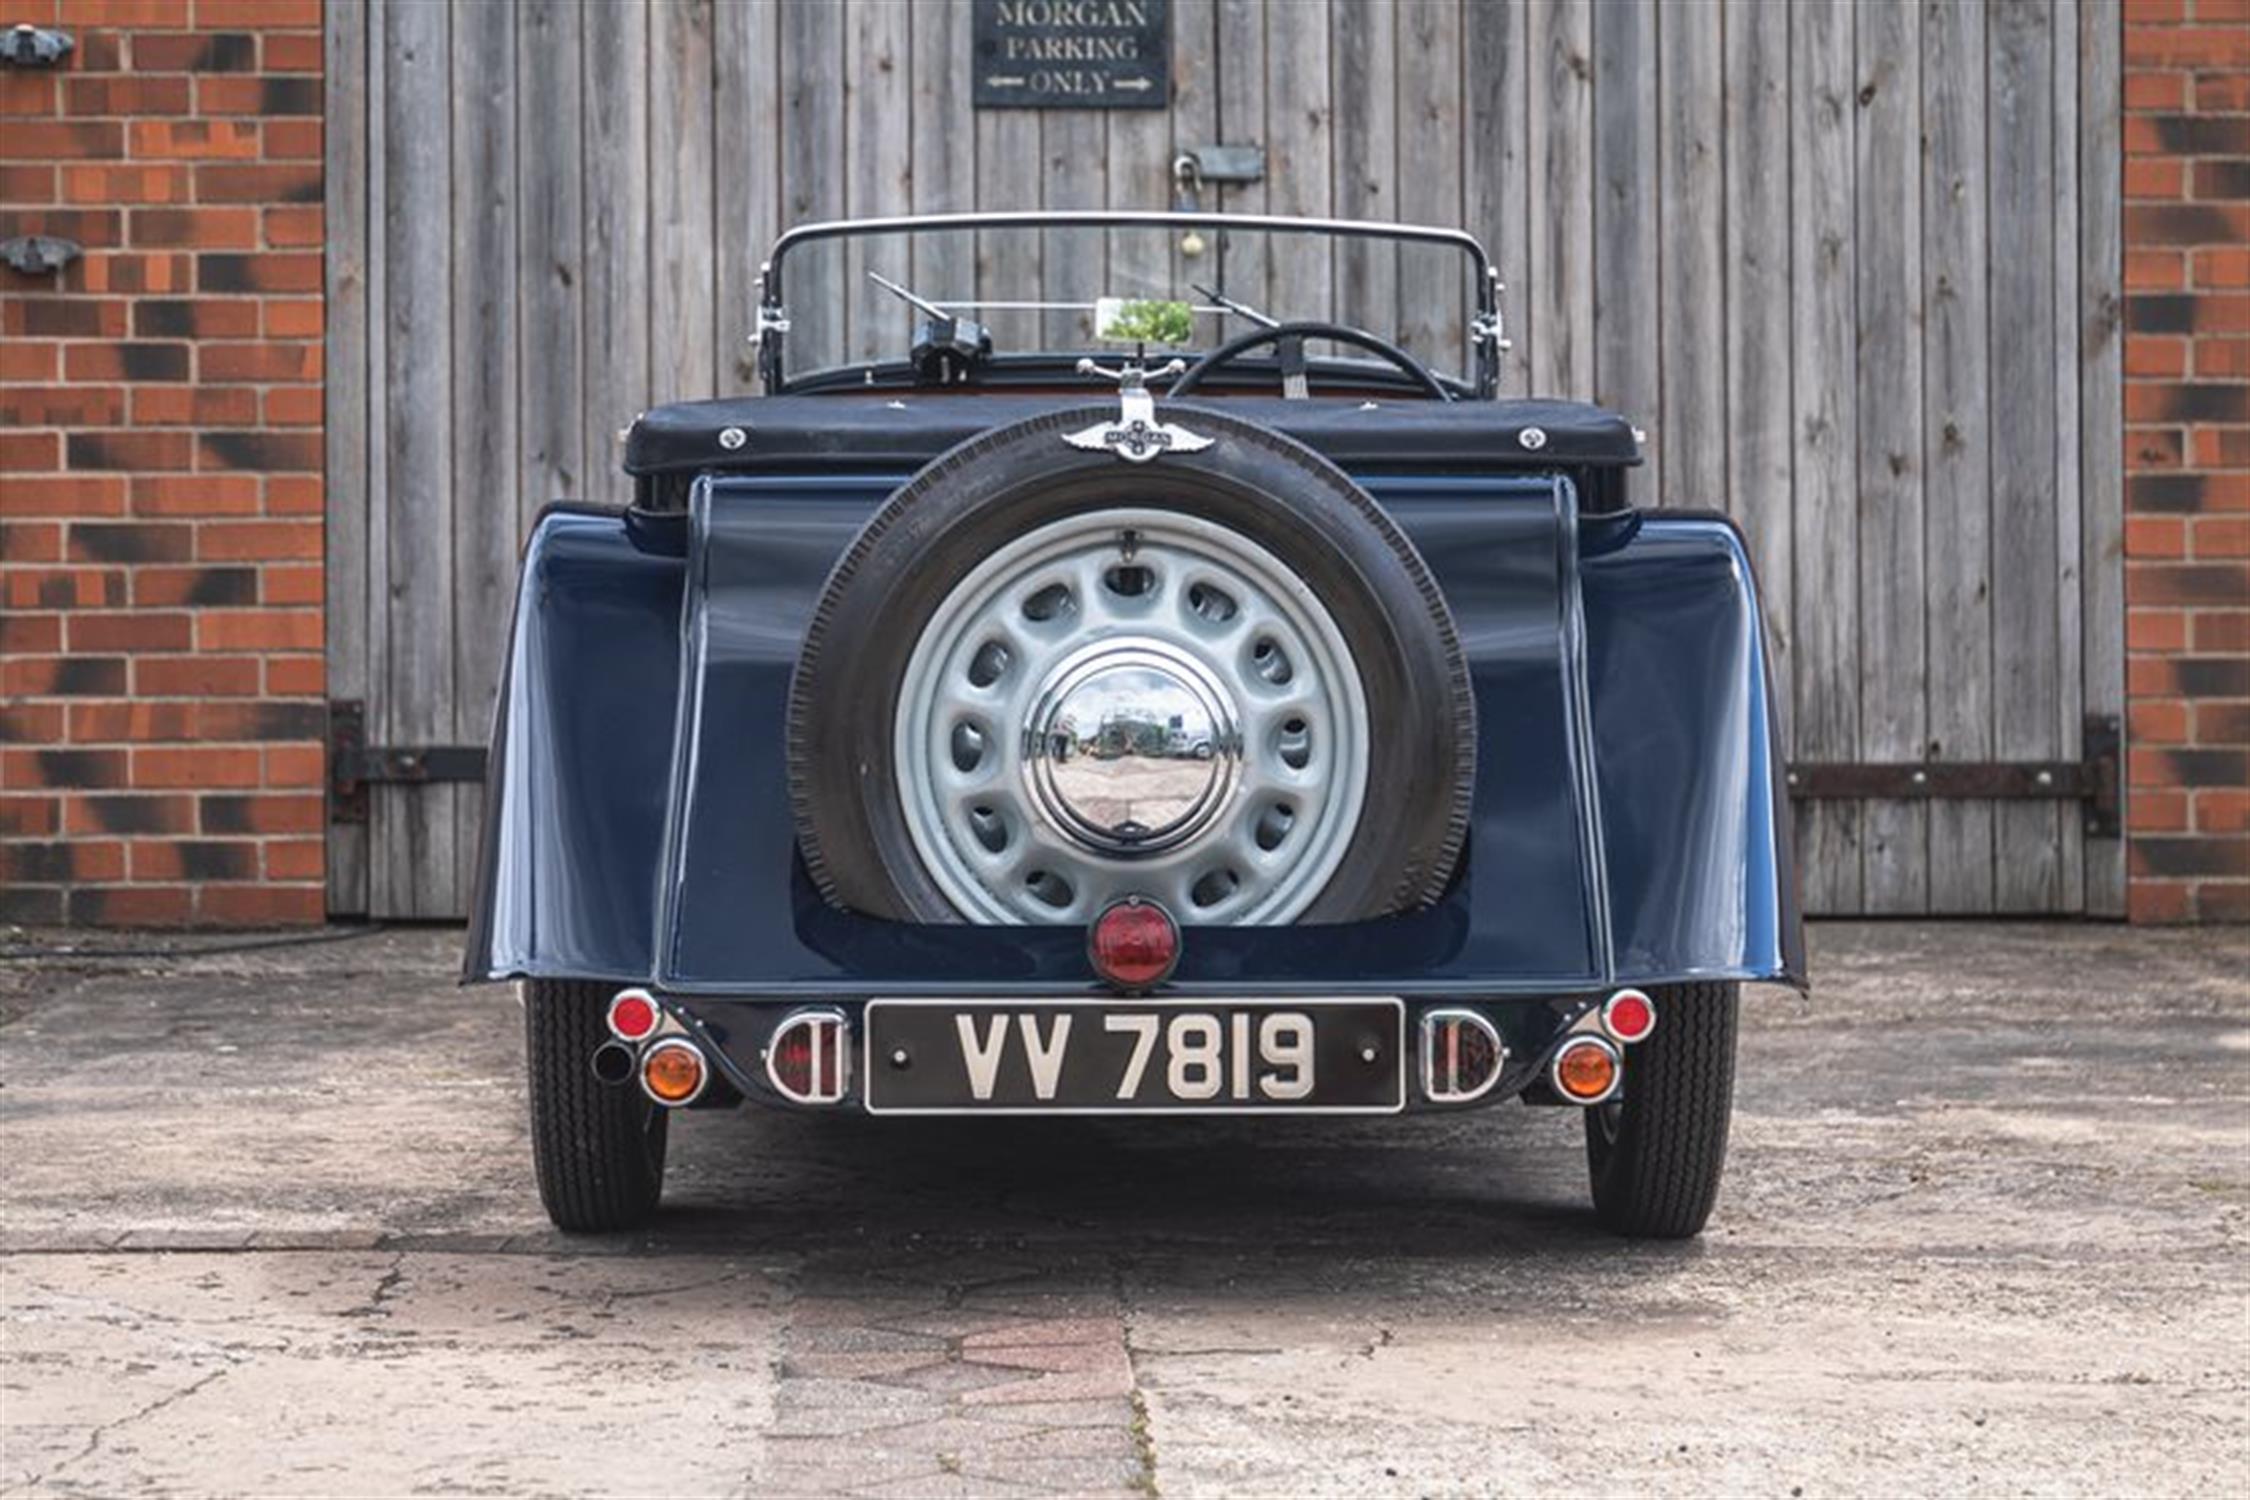 1939 Morgan 4/4 Series 1 'Flat Rad' (1098cc Climax Engine) - Image 6 of 10